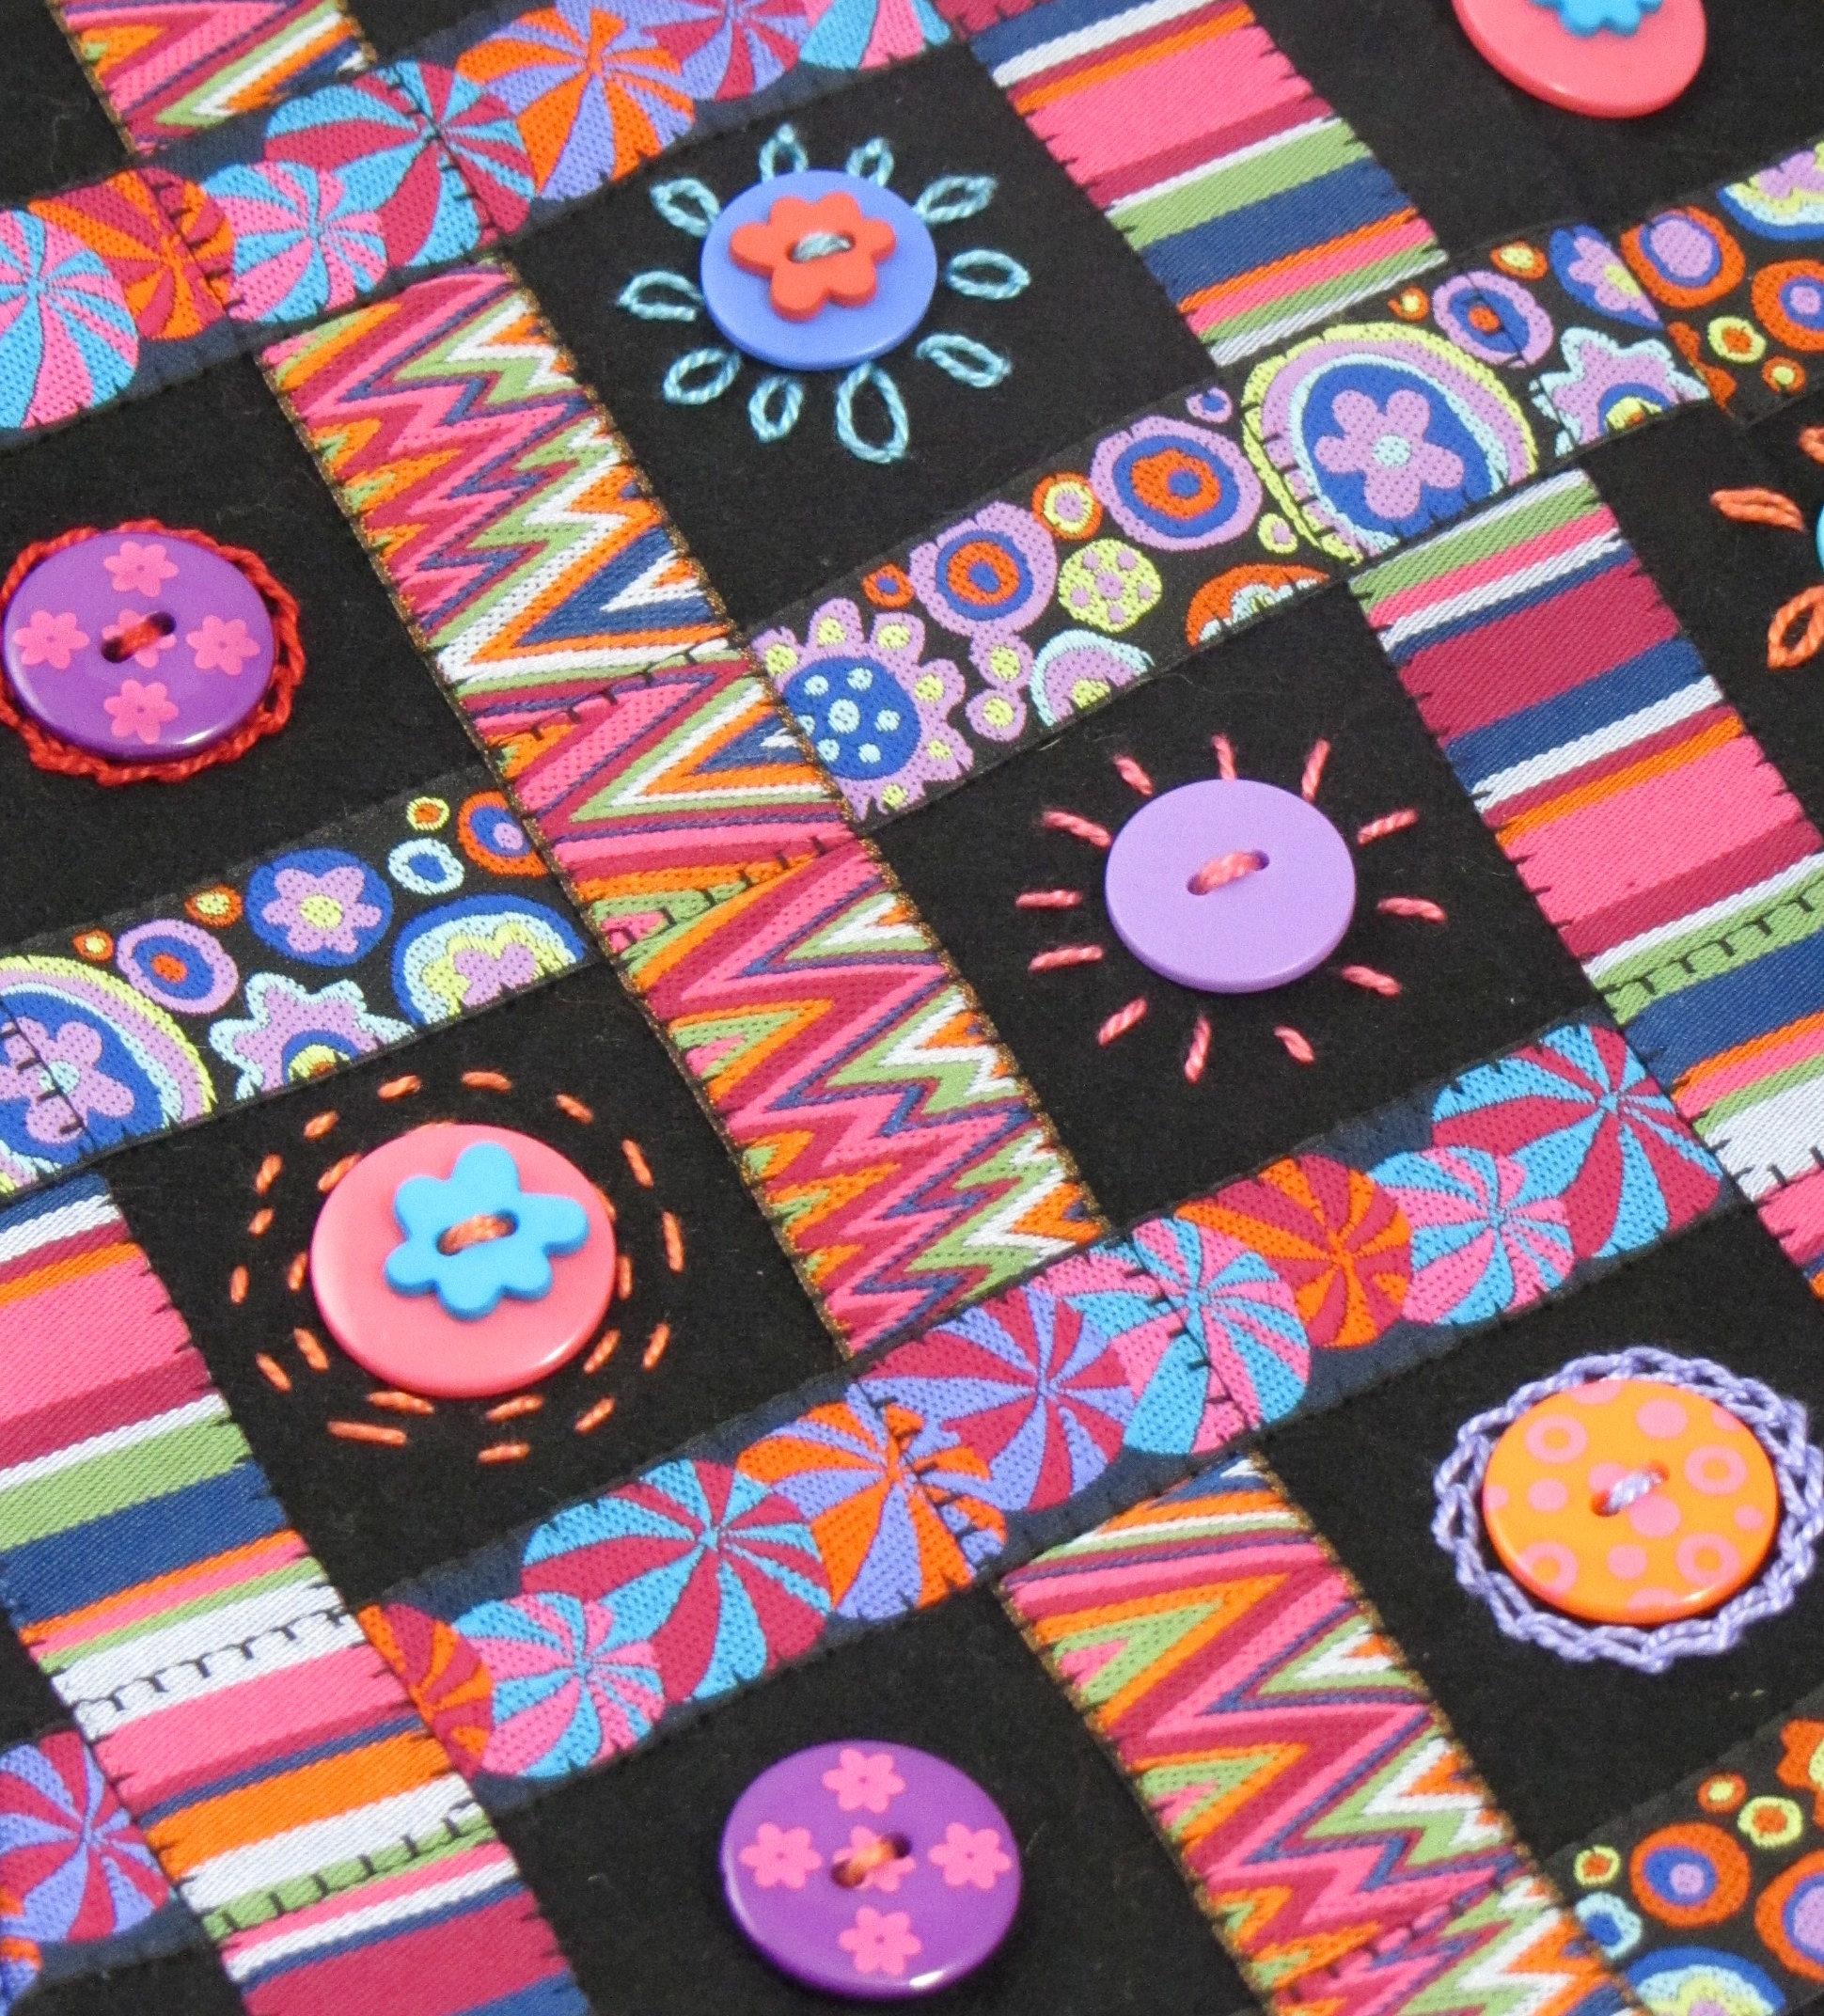 Elaine Schmidt Designs, sewing, ribbon, quilting, crafts ...